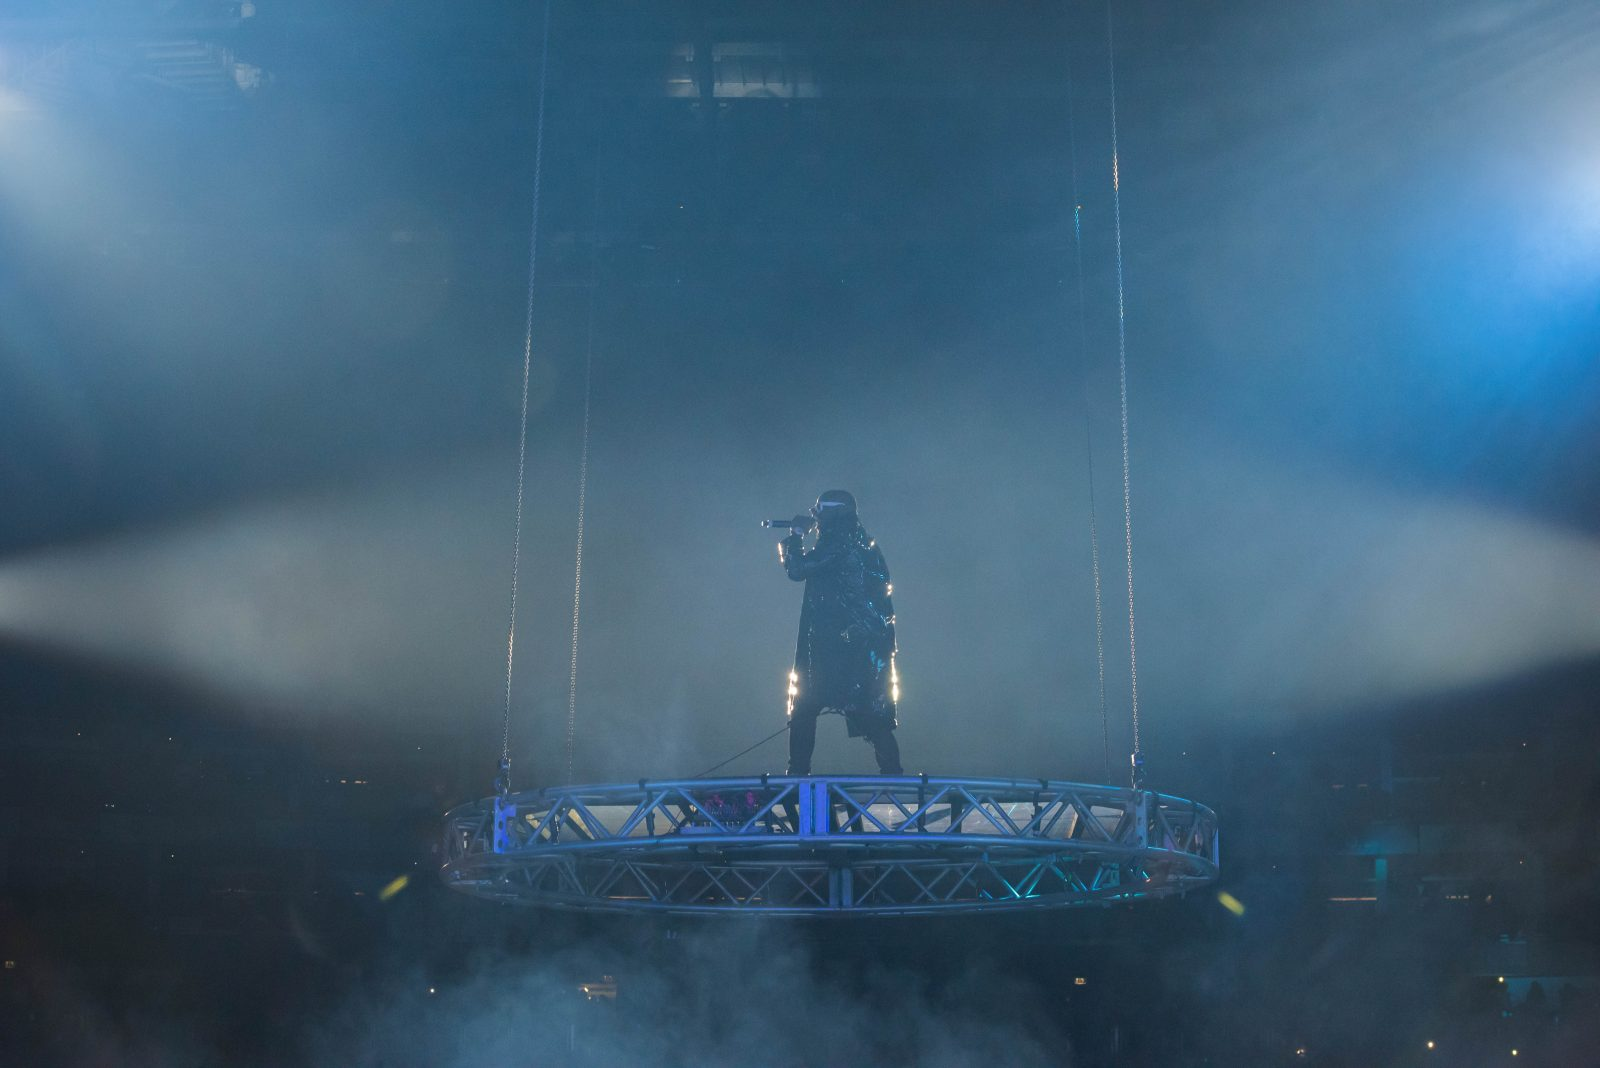 London, United Kingdom.  January 27, 2019. Davido performs live on stage at  The O2 Arena. Michael Tubi / Alamy Live News